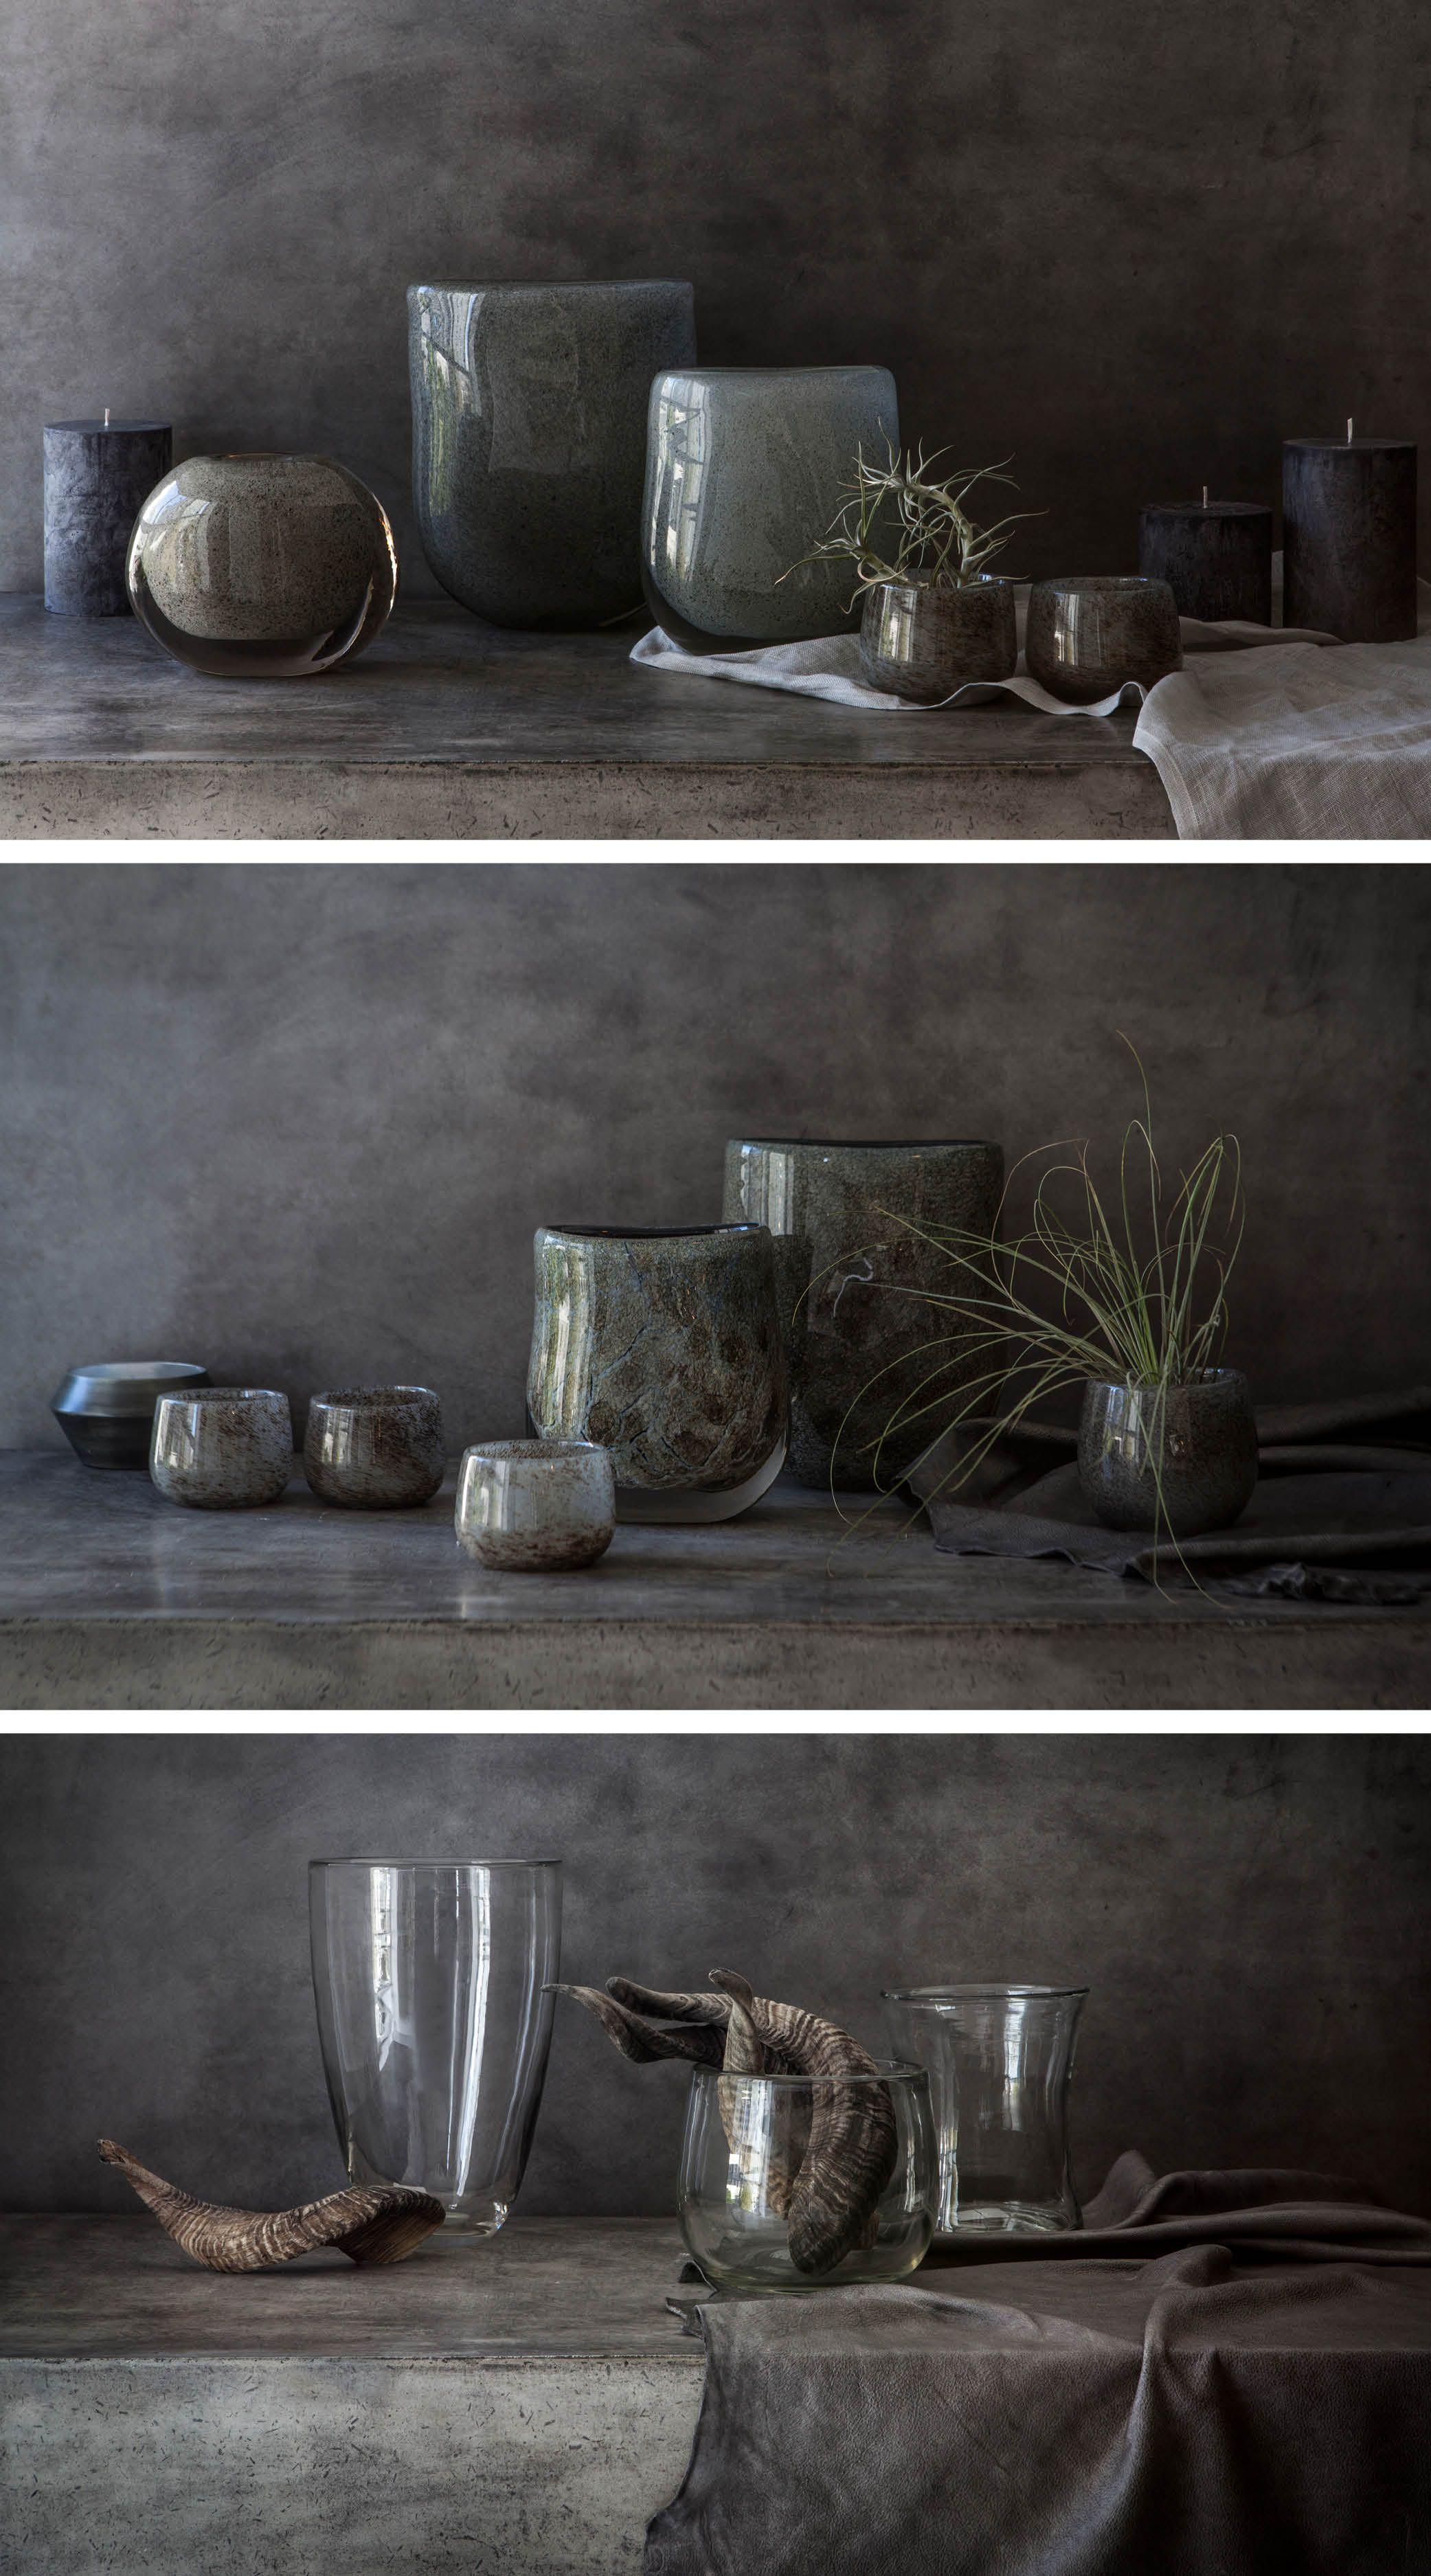 Weylandts Stocks A Selection Of Handmade Dutz Glass Vases